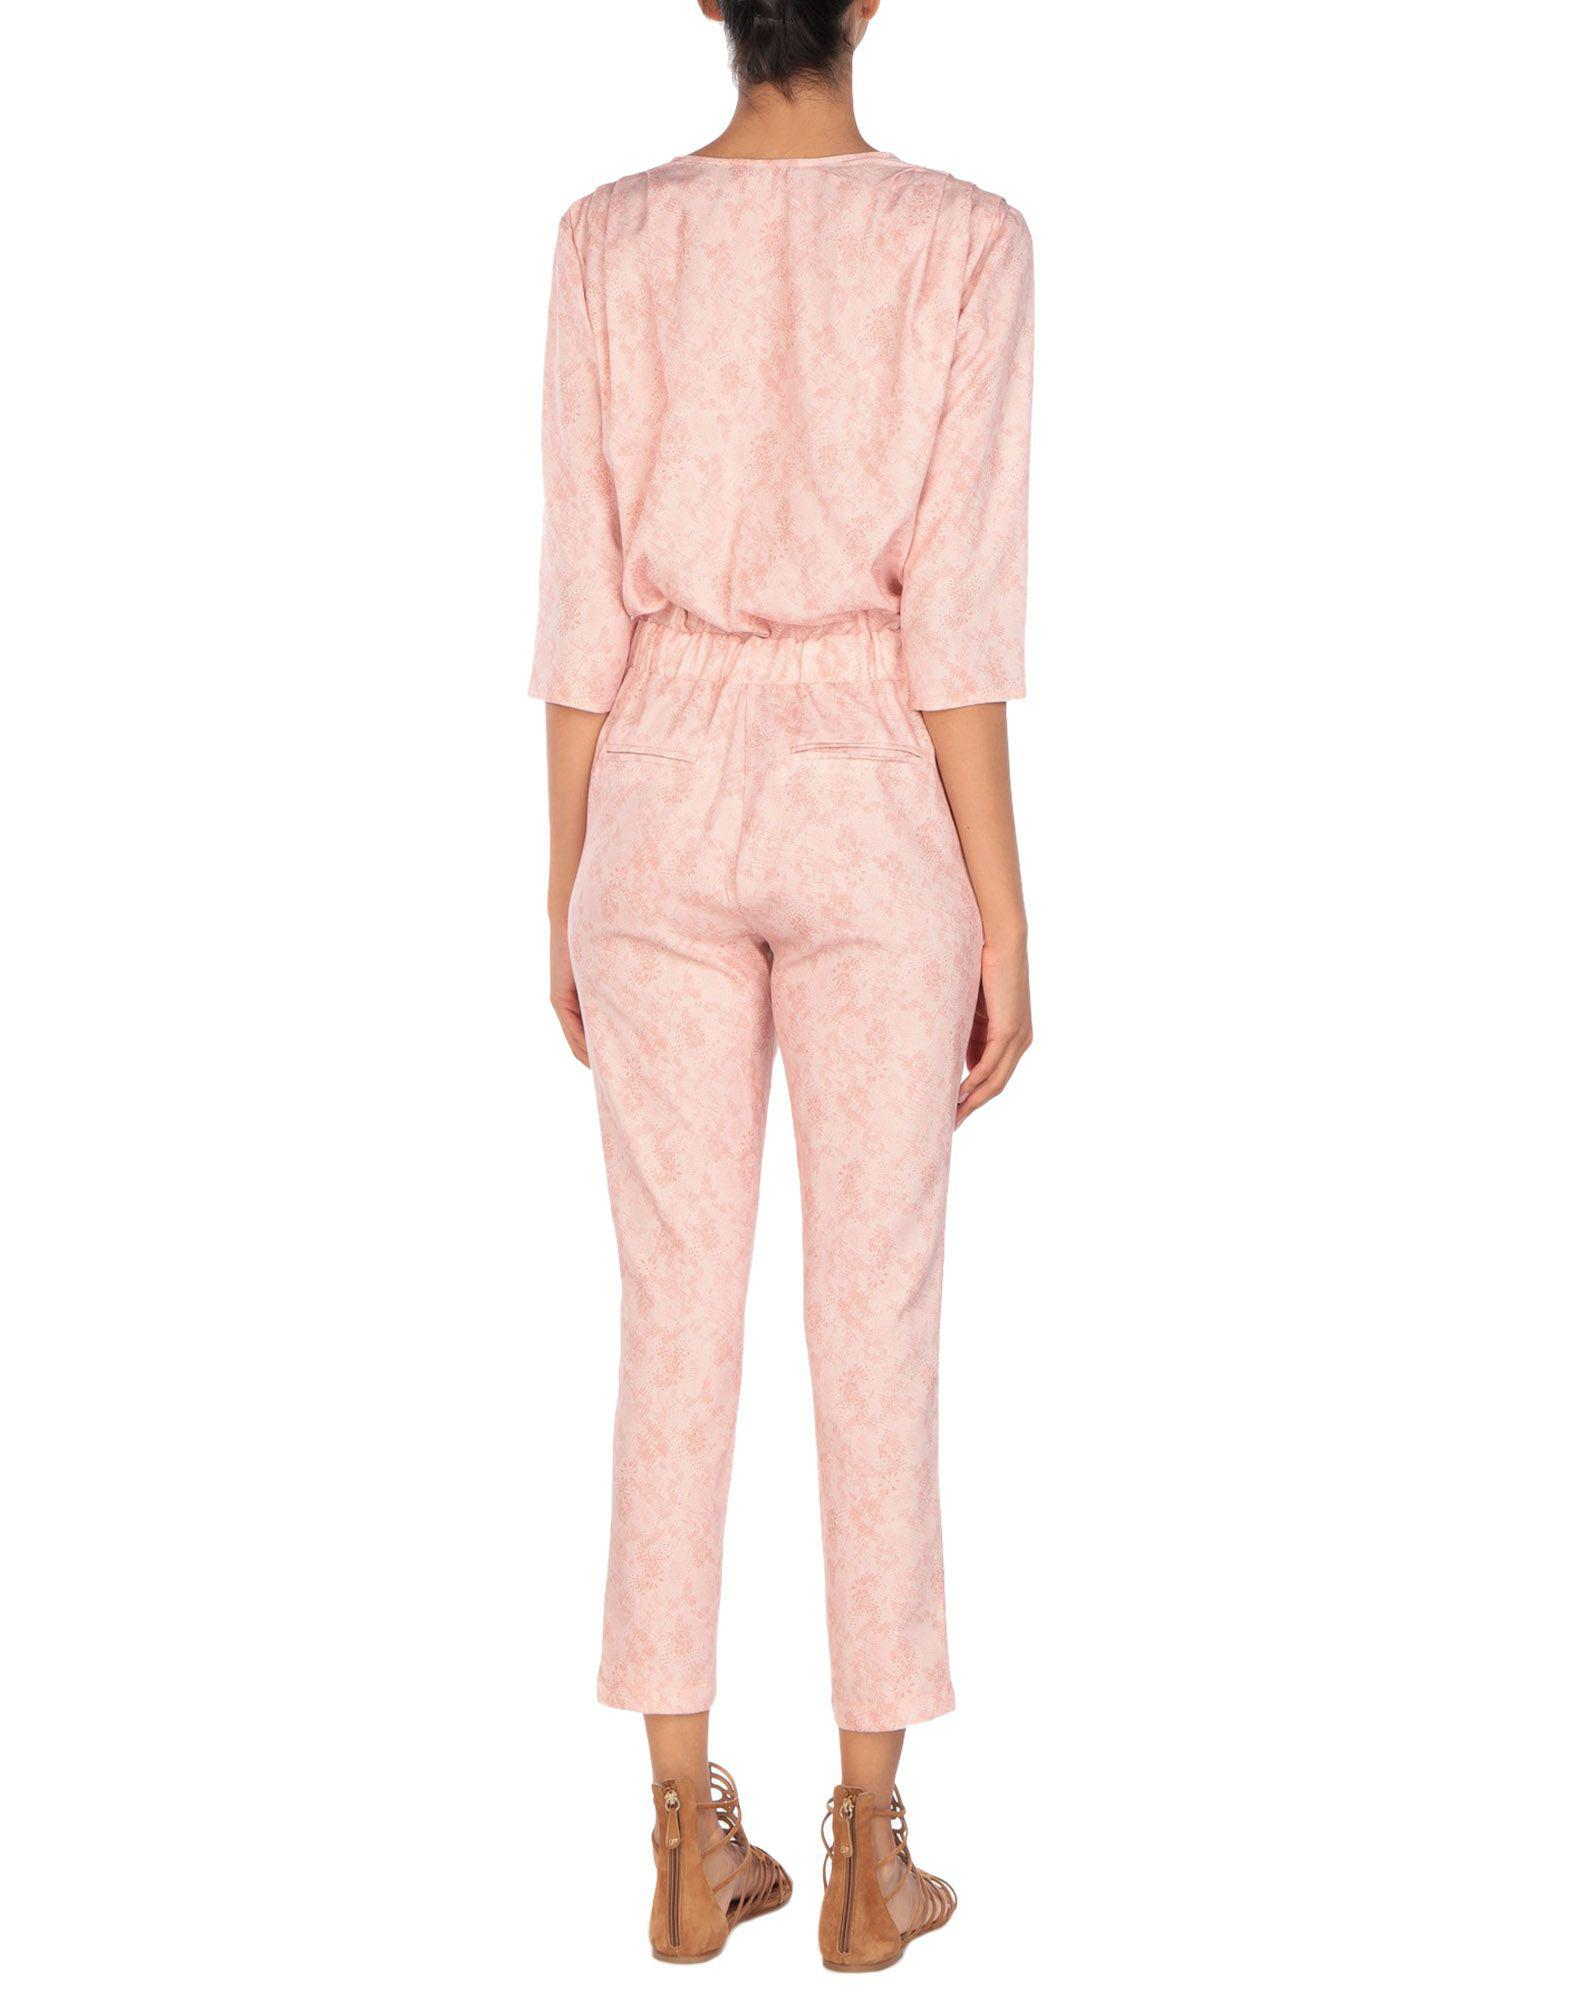 968bf754802 Lyst - Soallure Jumpsuit in Pink